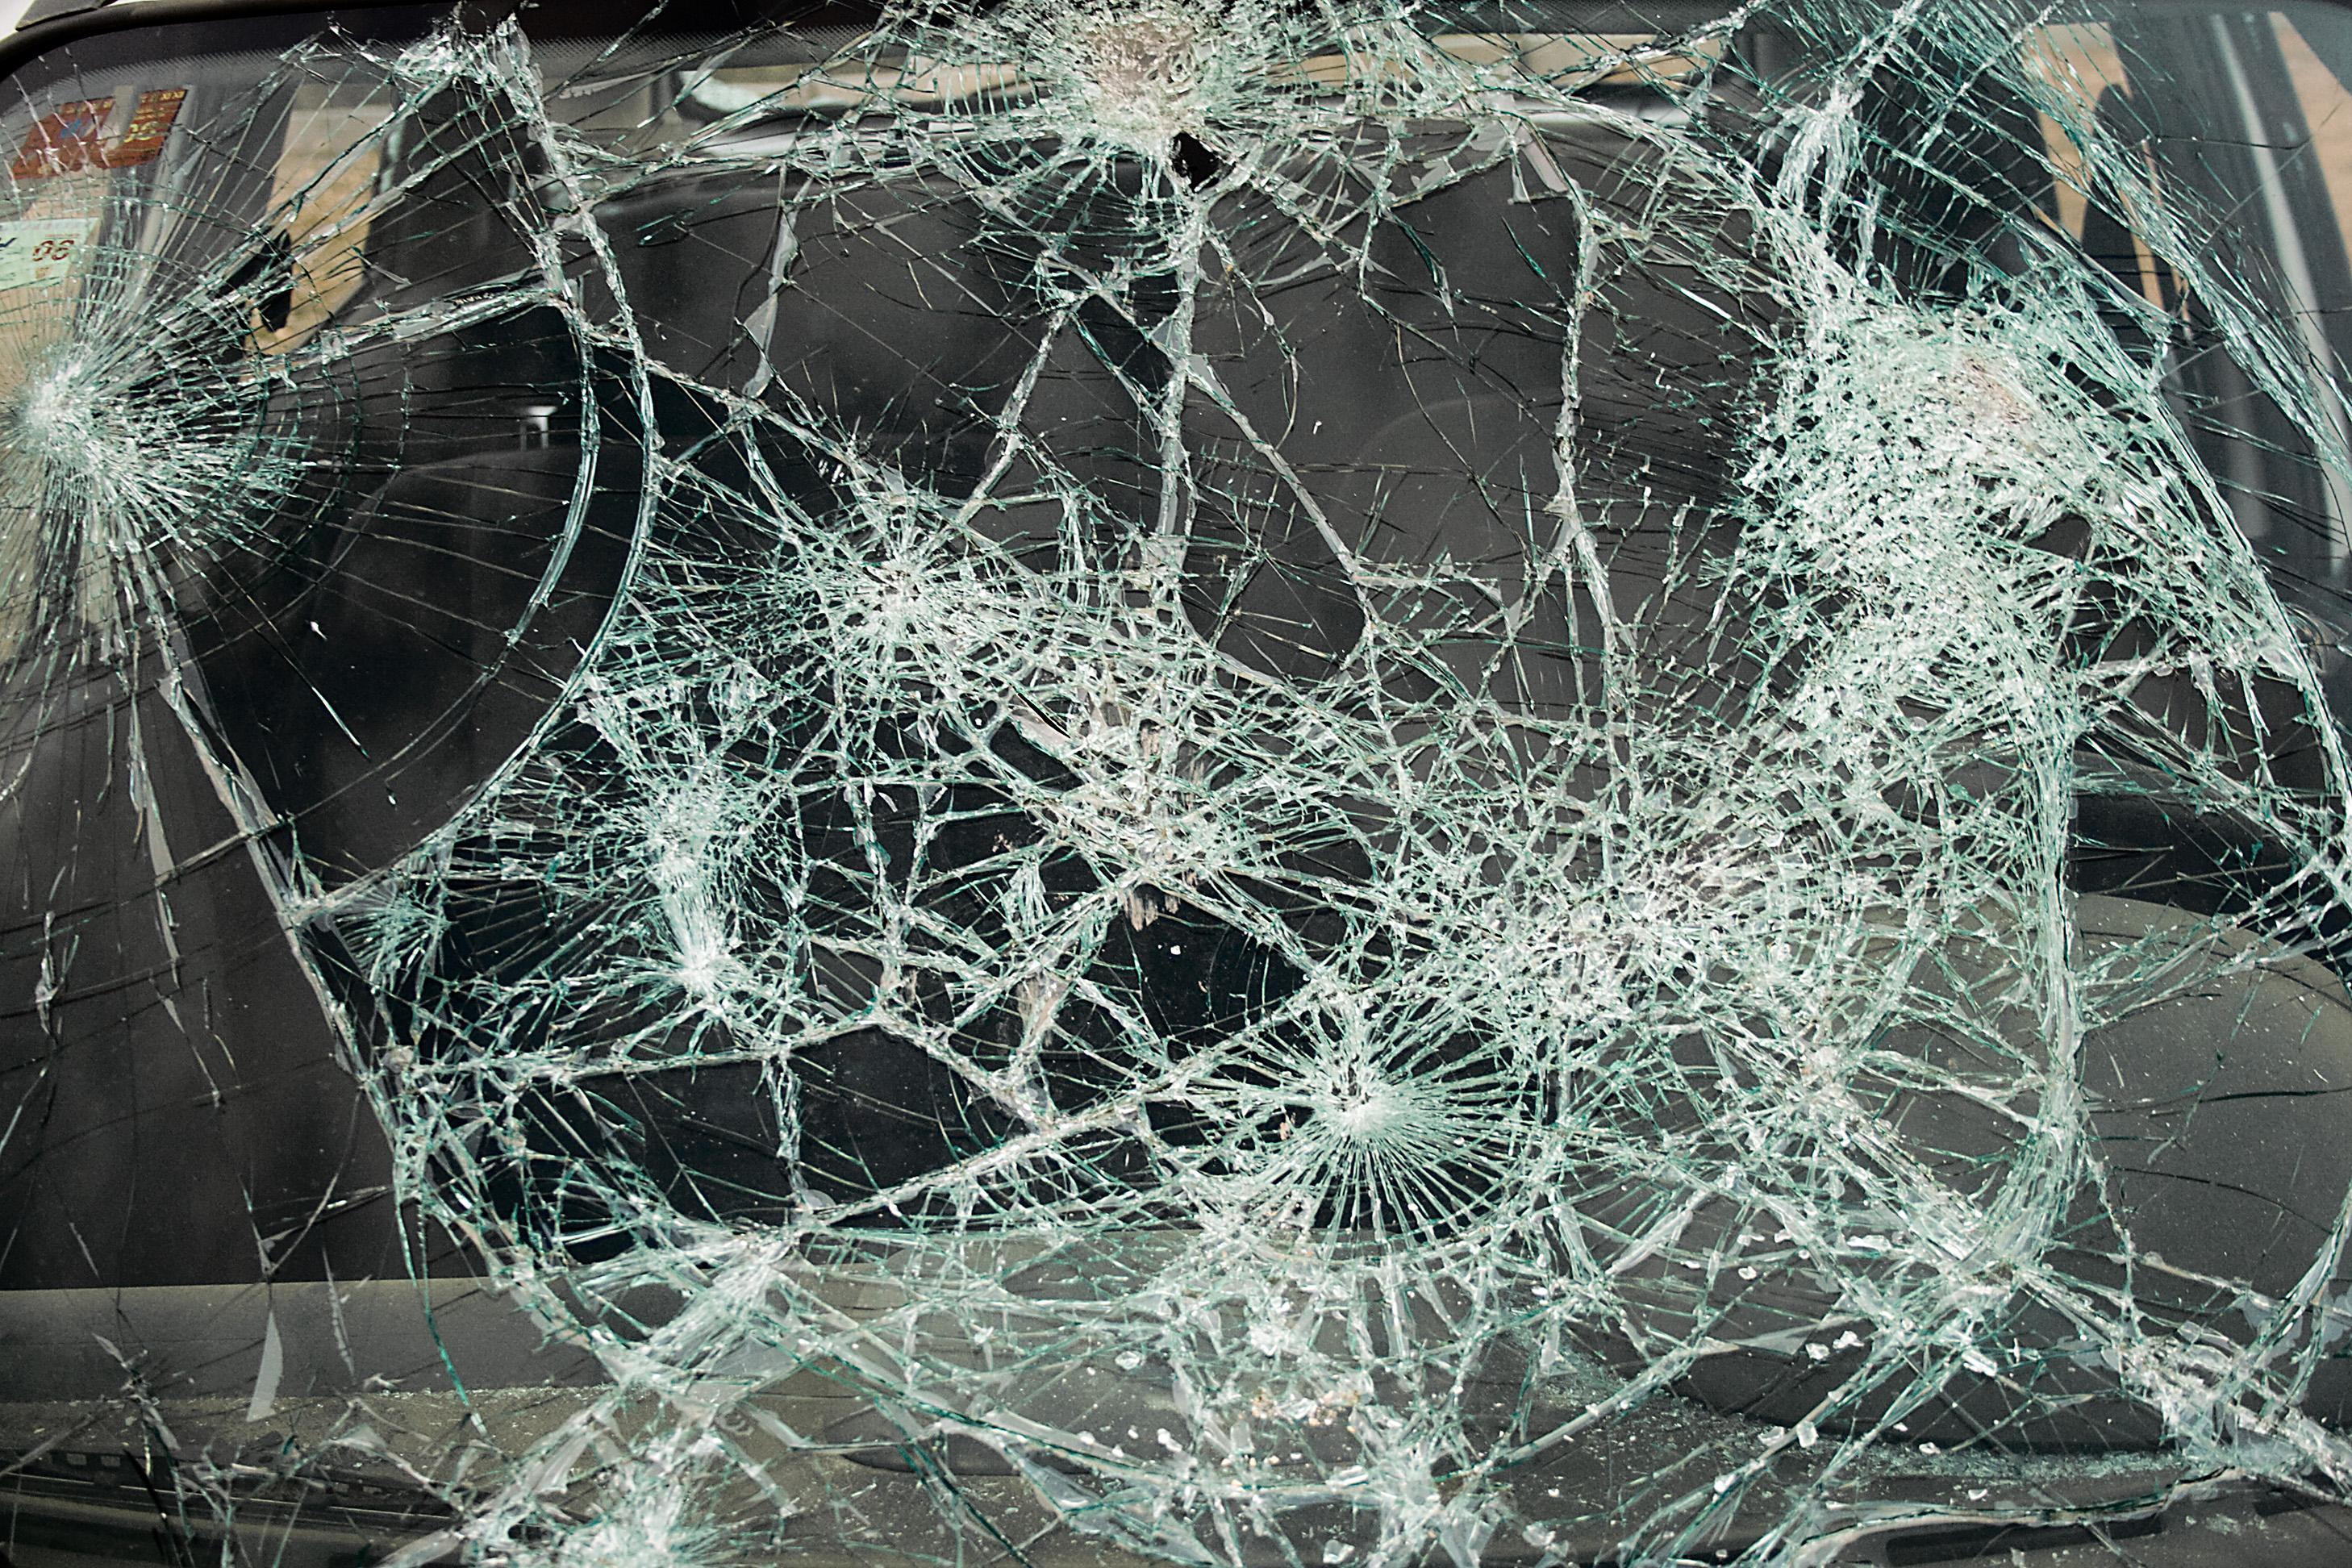 45 Realistic Cracked and Broken Screen Wallpapers   Technosamrat 2916x1944